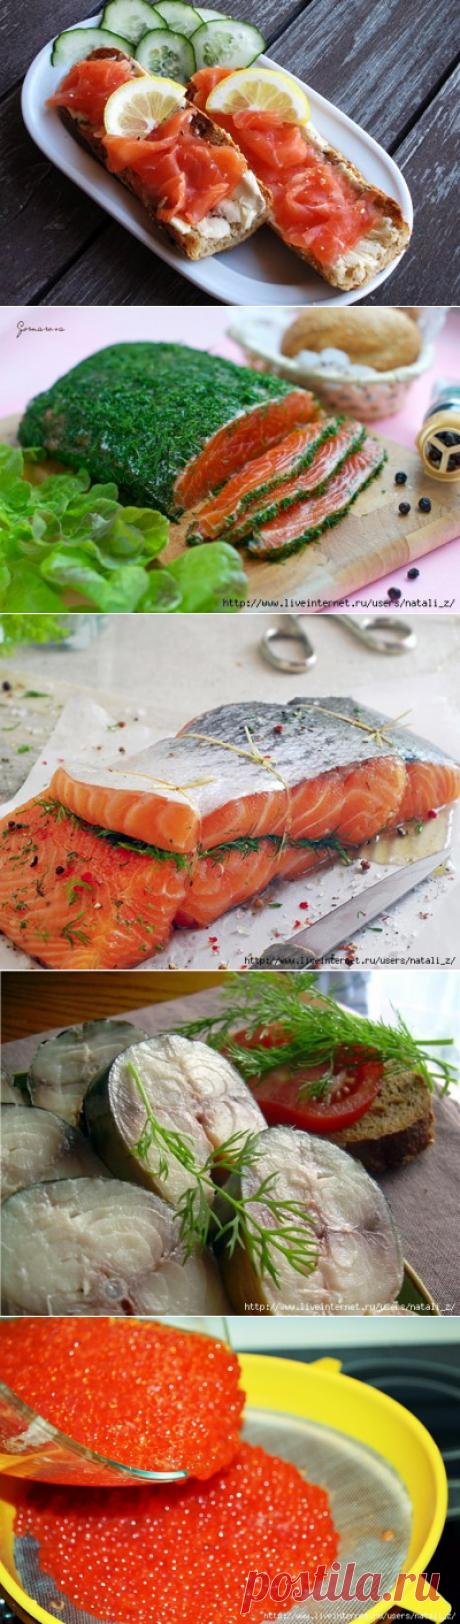 Рыбный пир